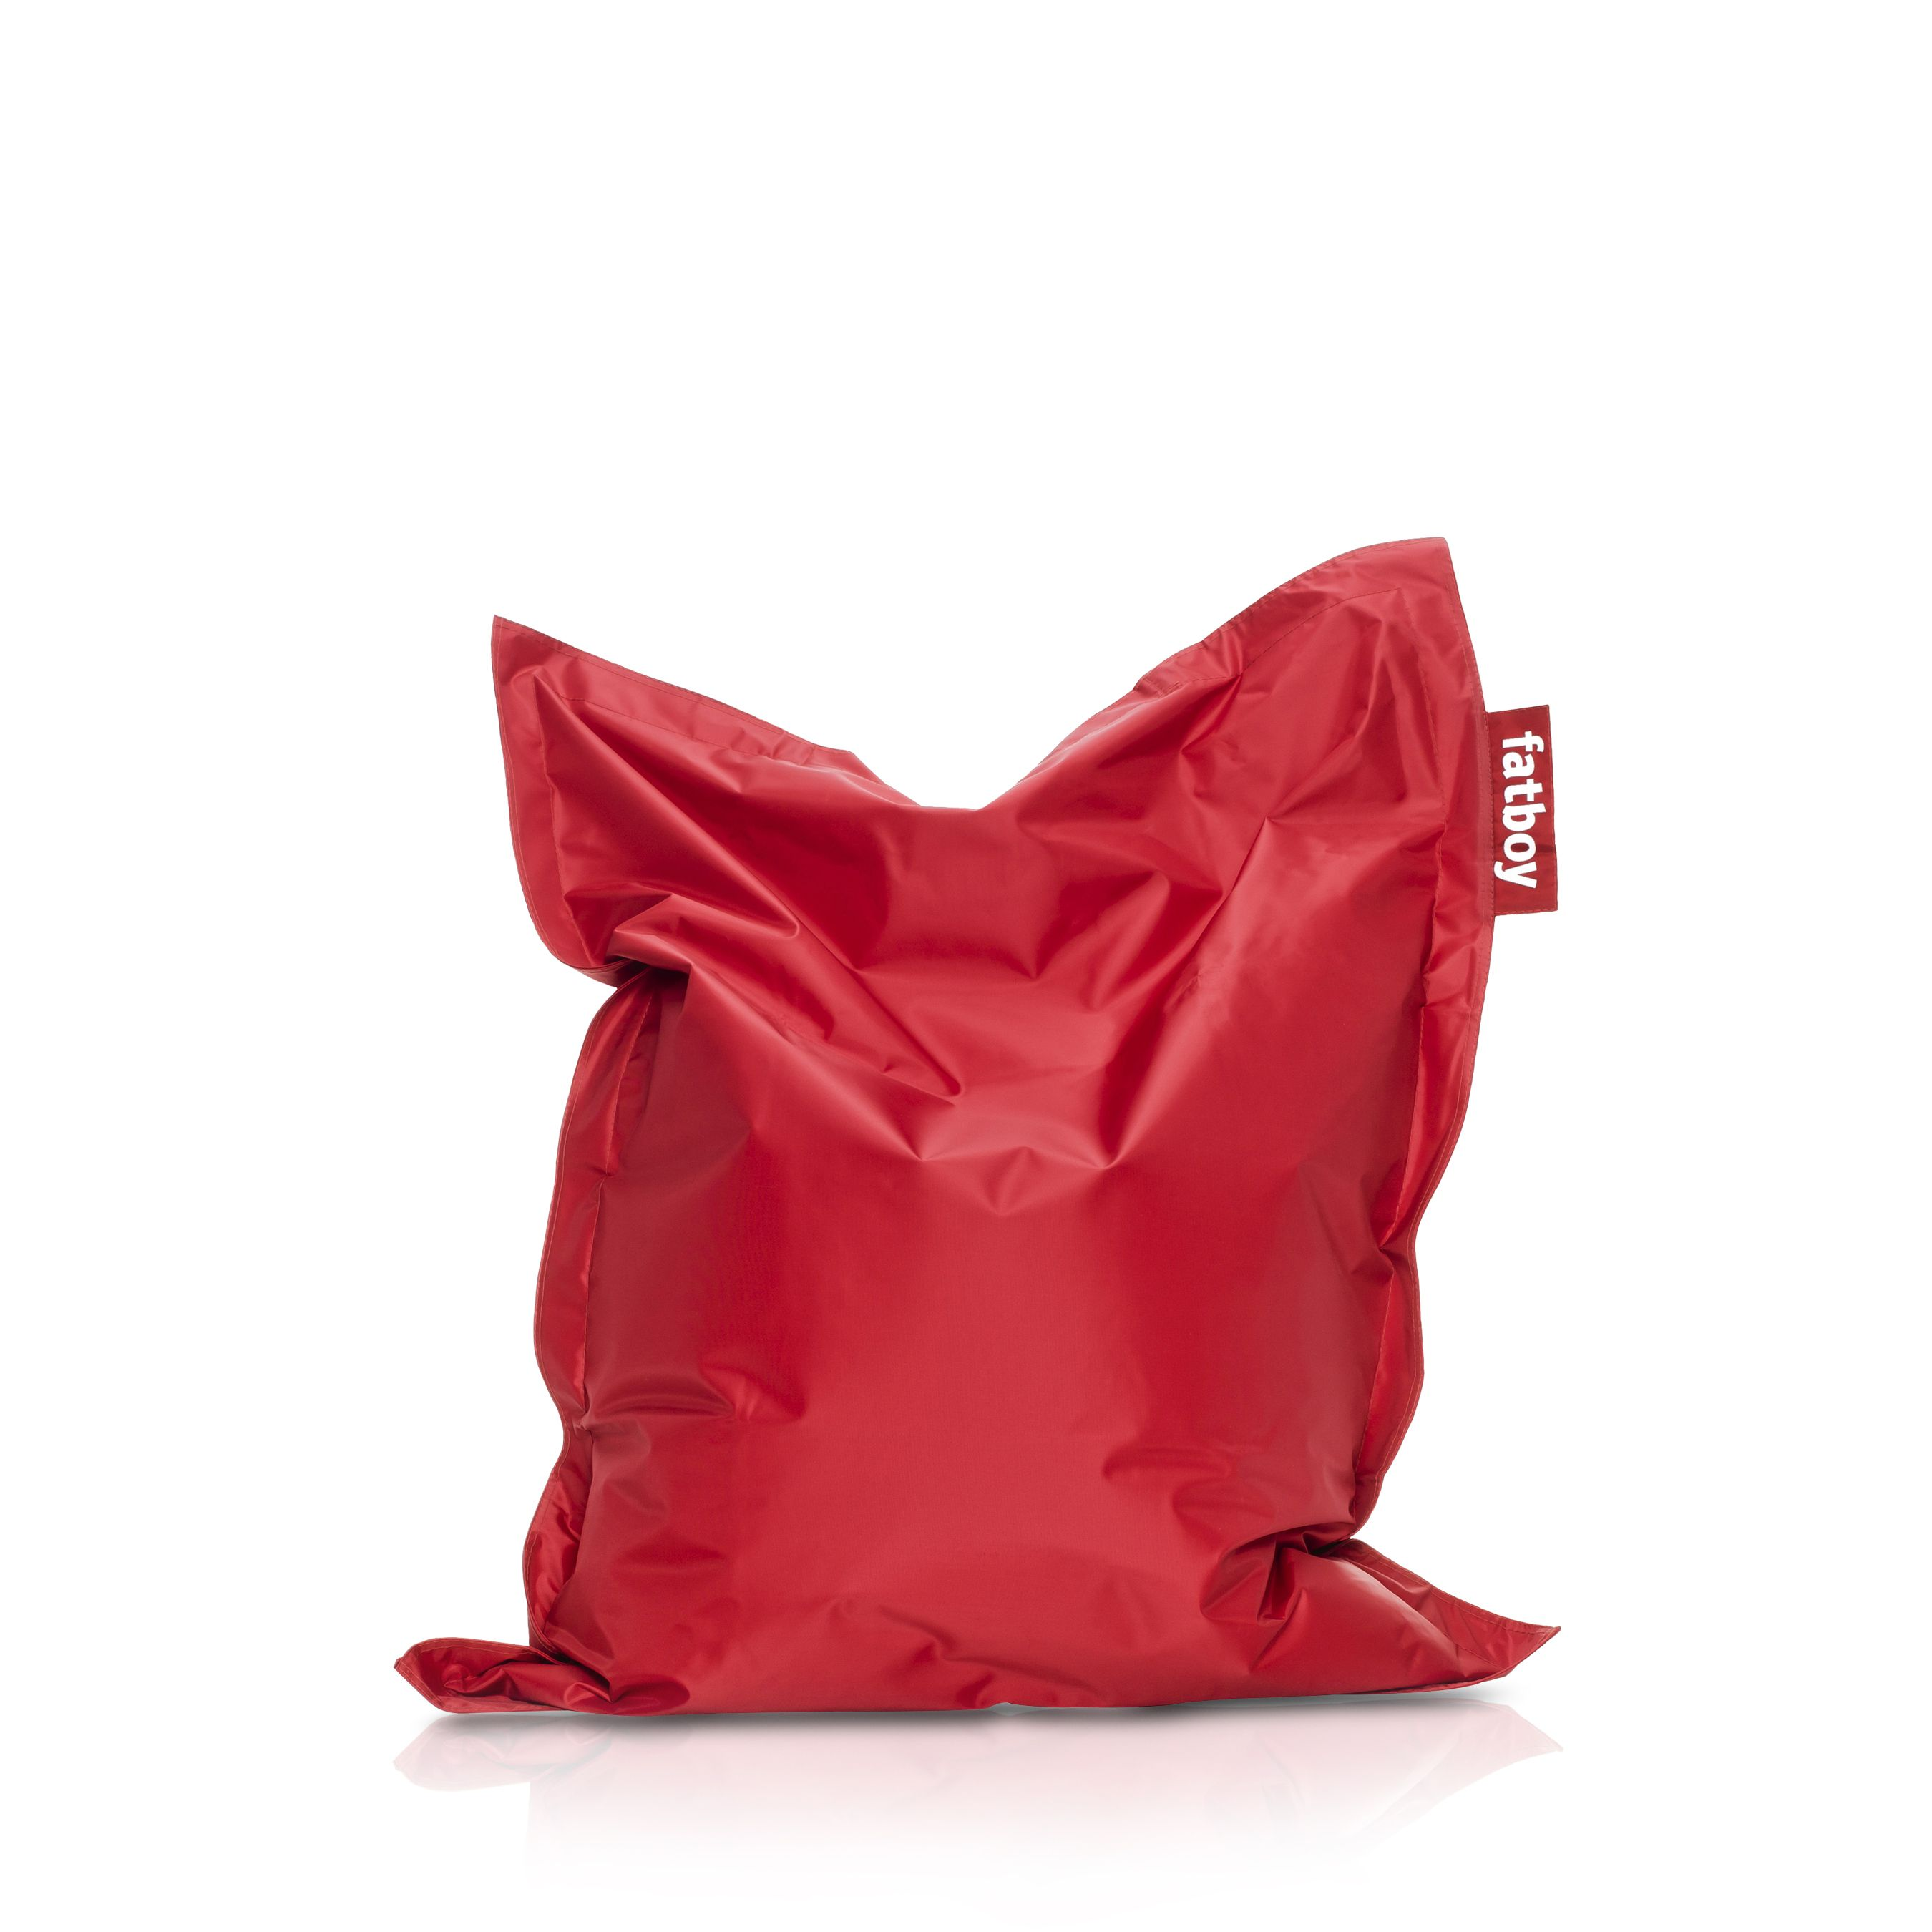 Fatboy Junior, Red Bean bag, Bean bag lounger, Large